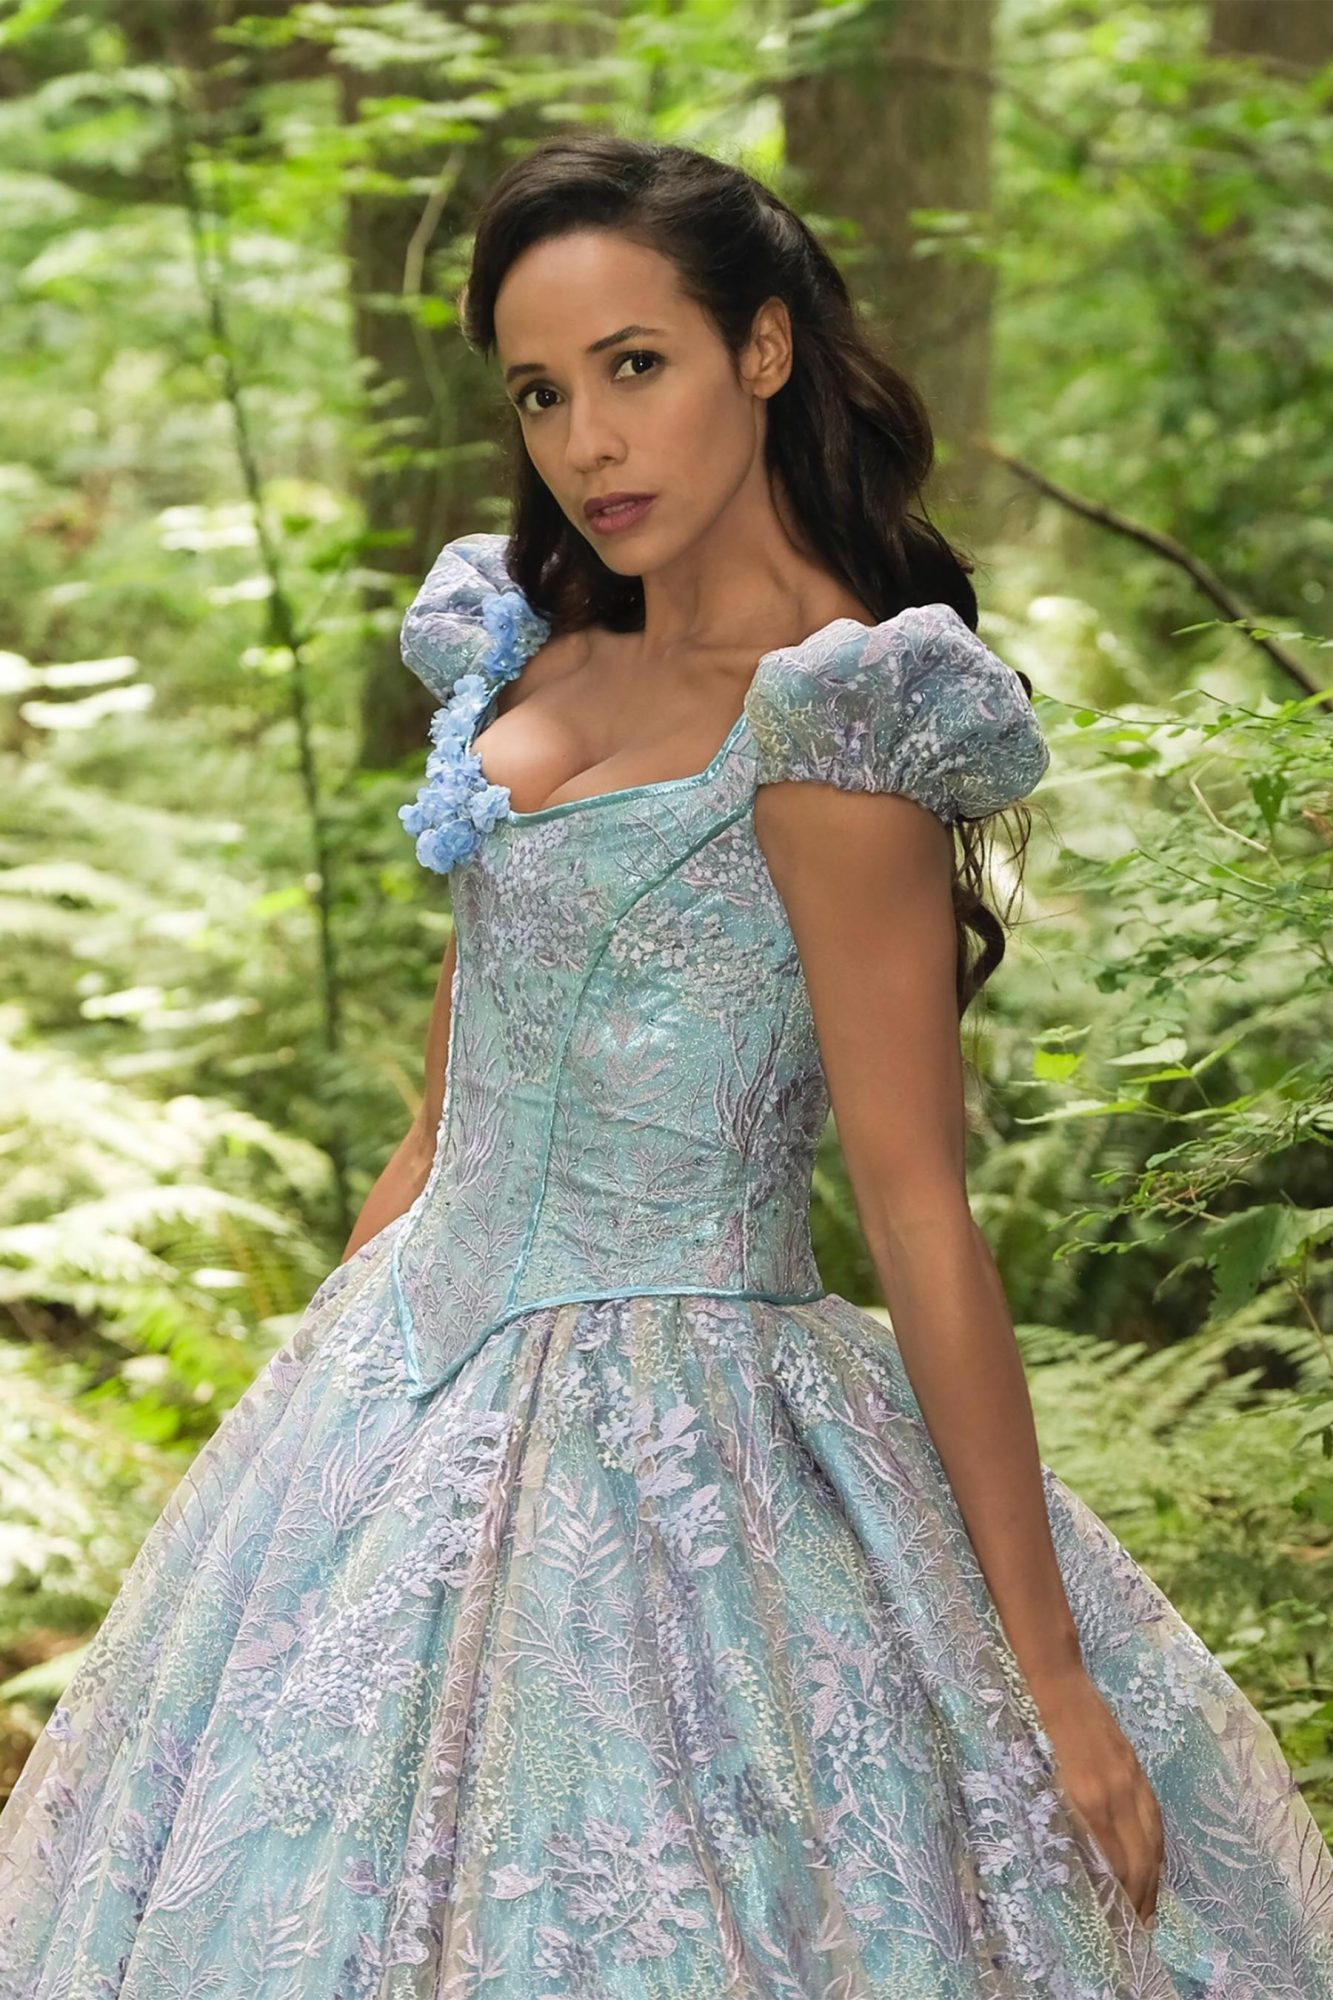 Cinderella (Dania Ramirez)